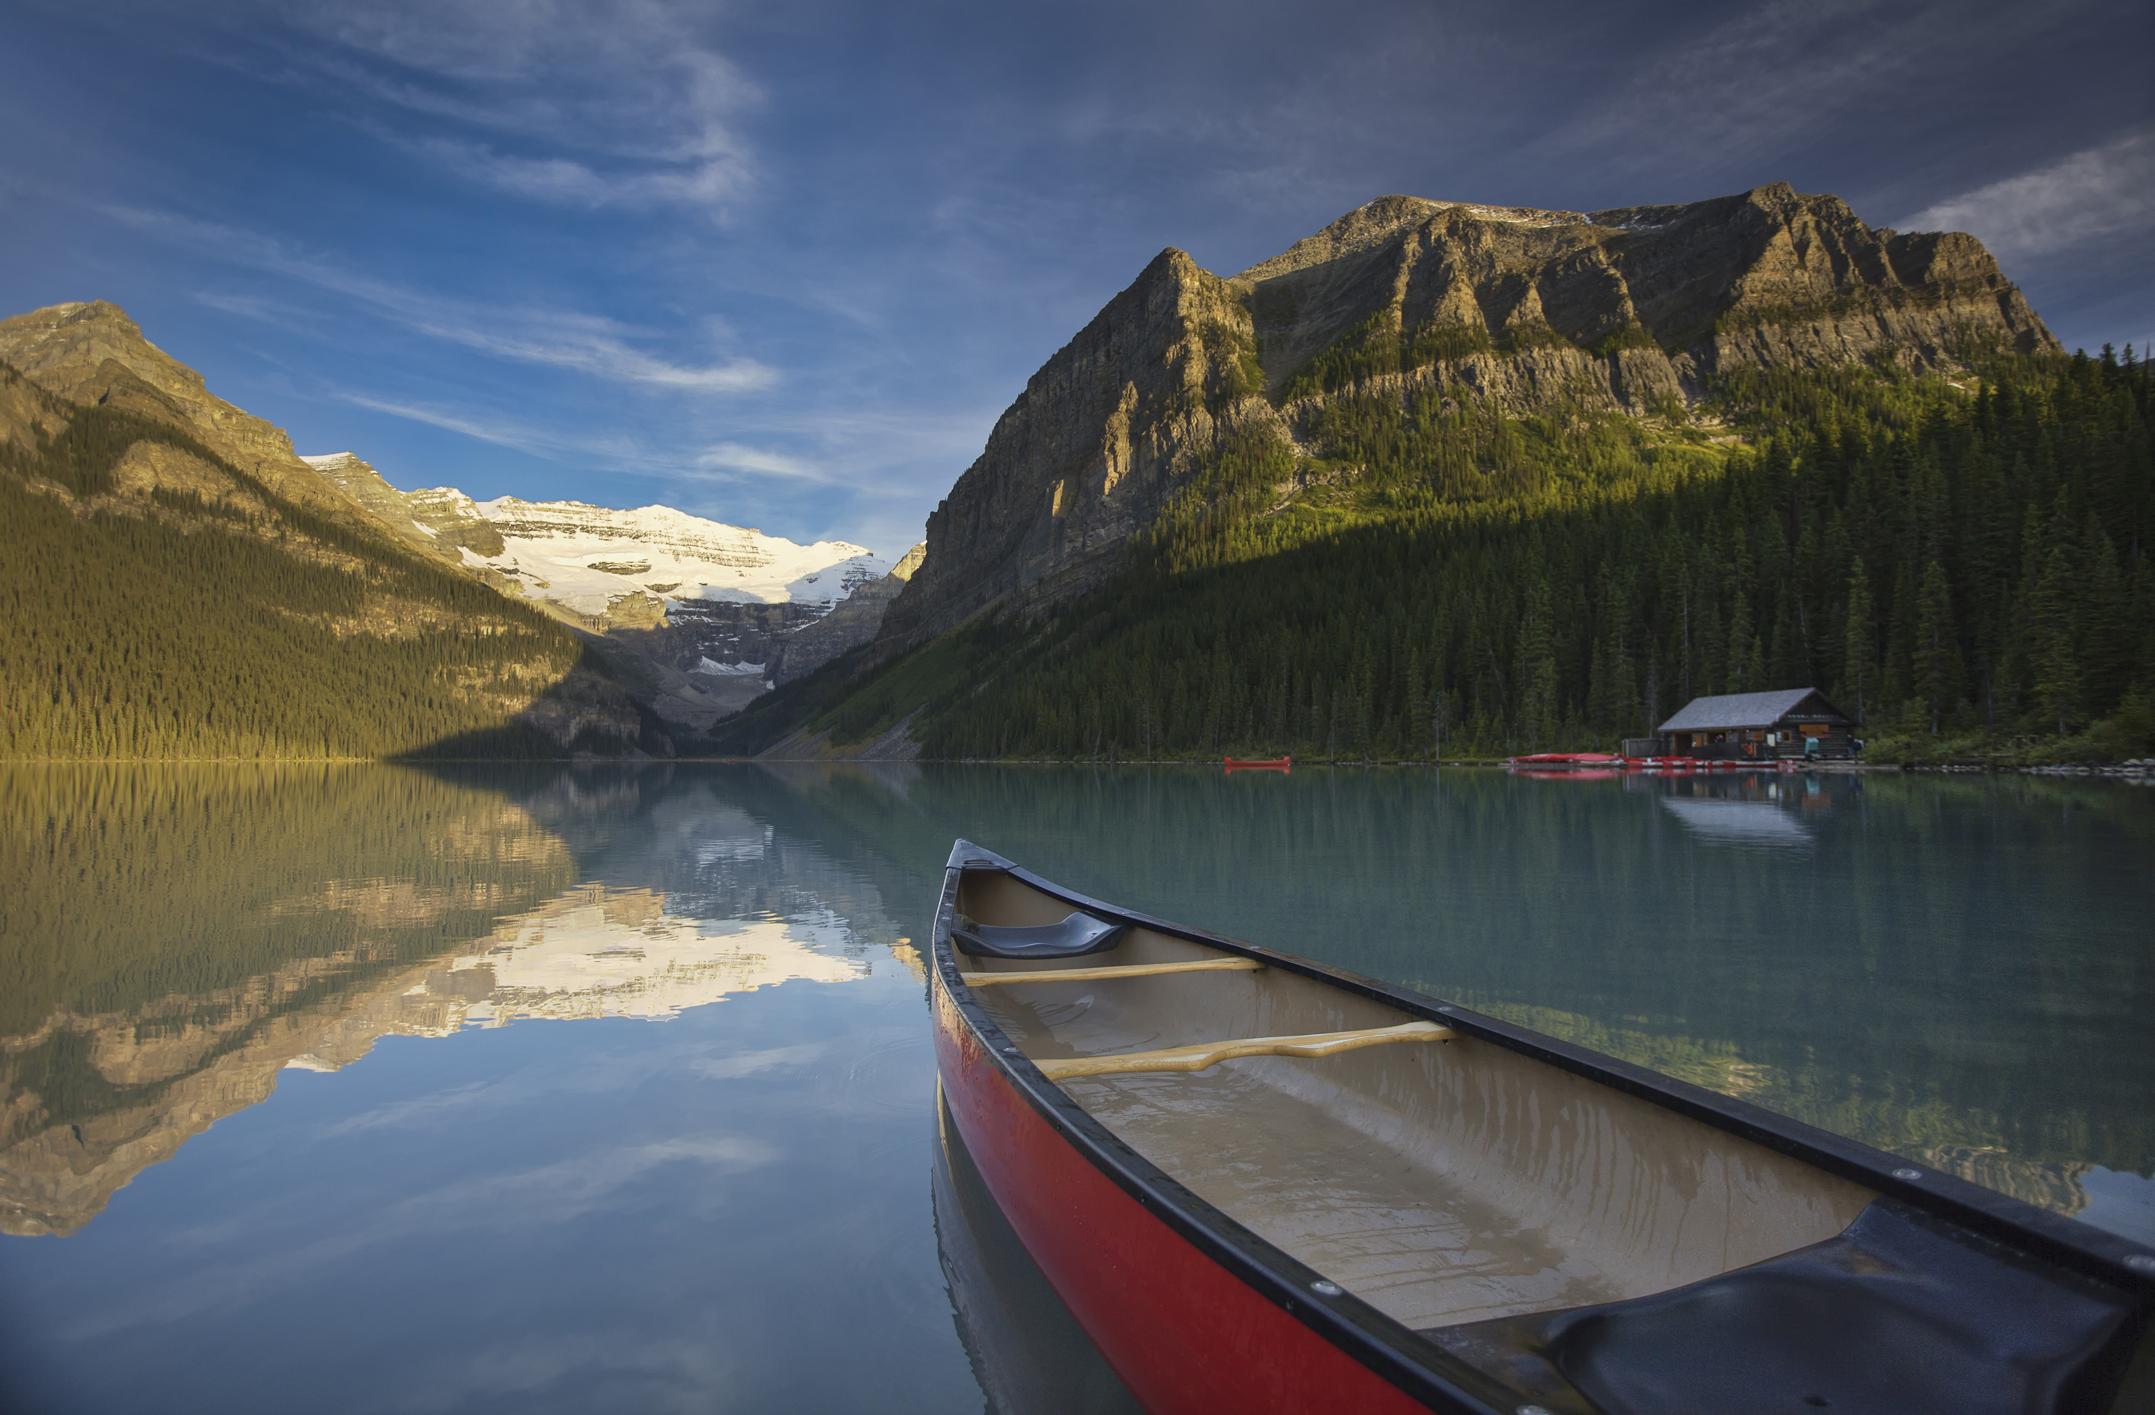 Alberta Canada Lake Louise